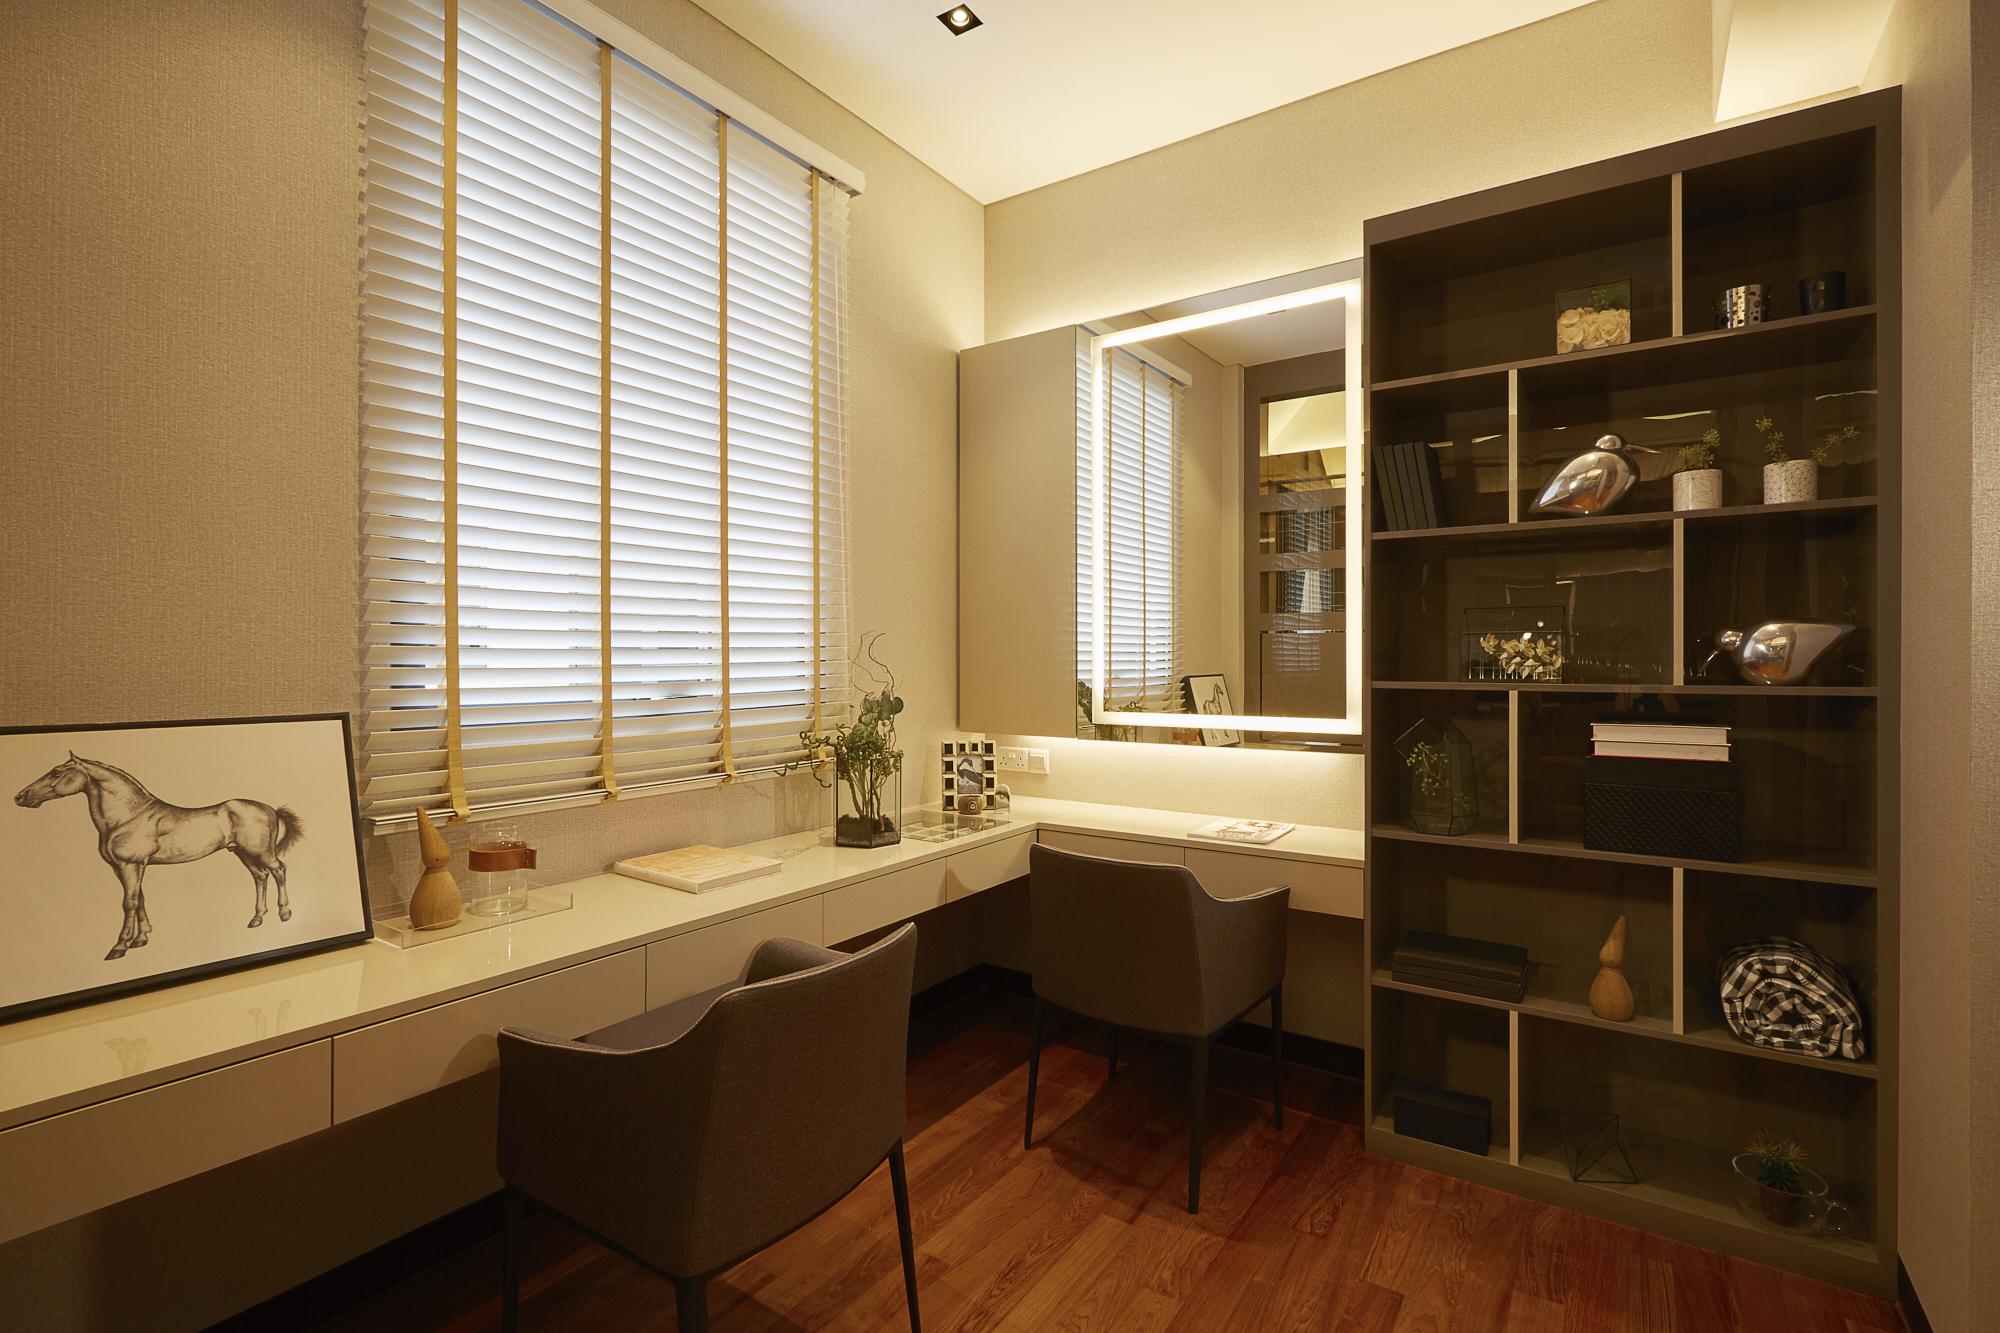 Charlton_Study Room_057_main.jpg